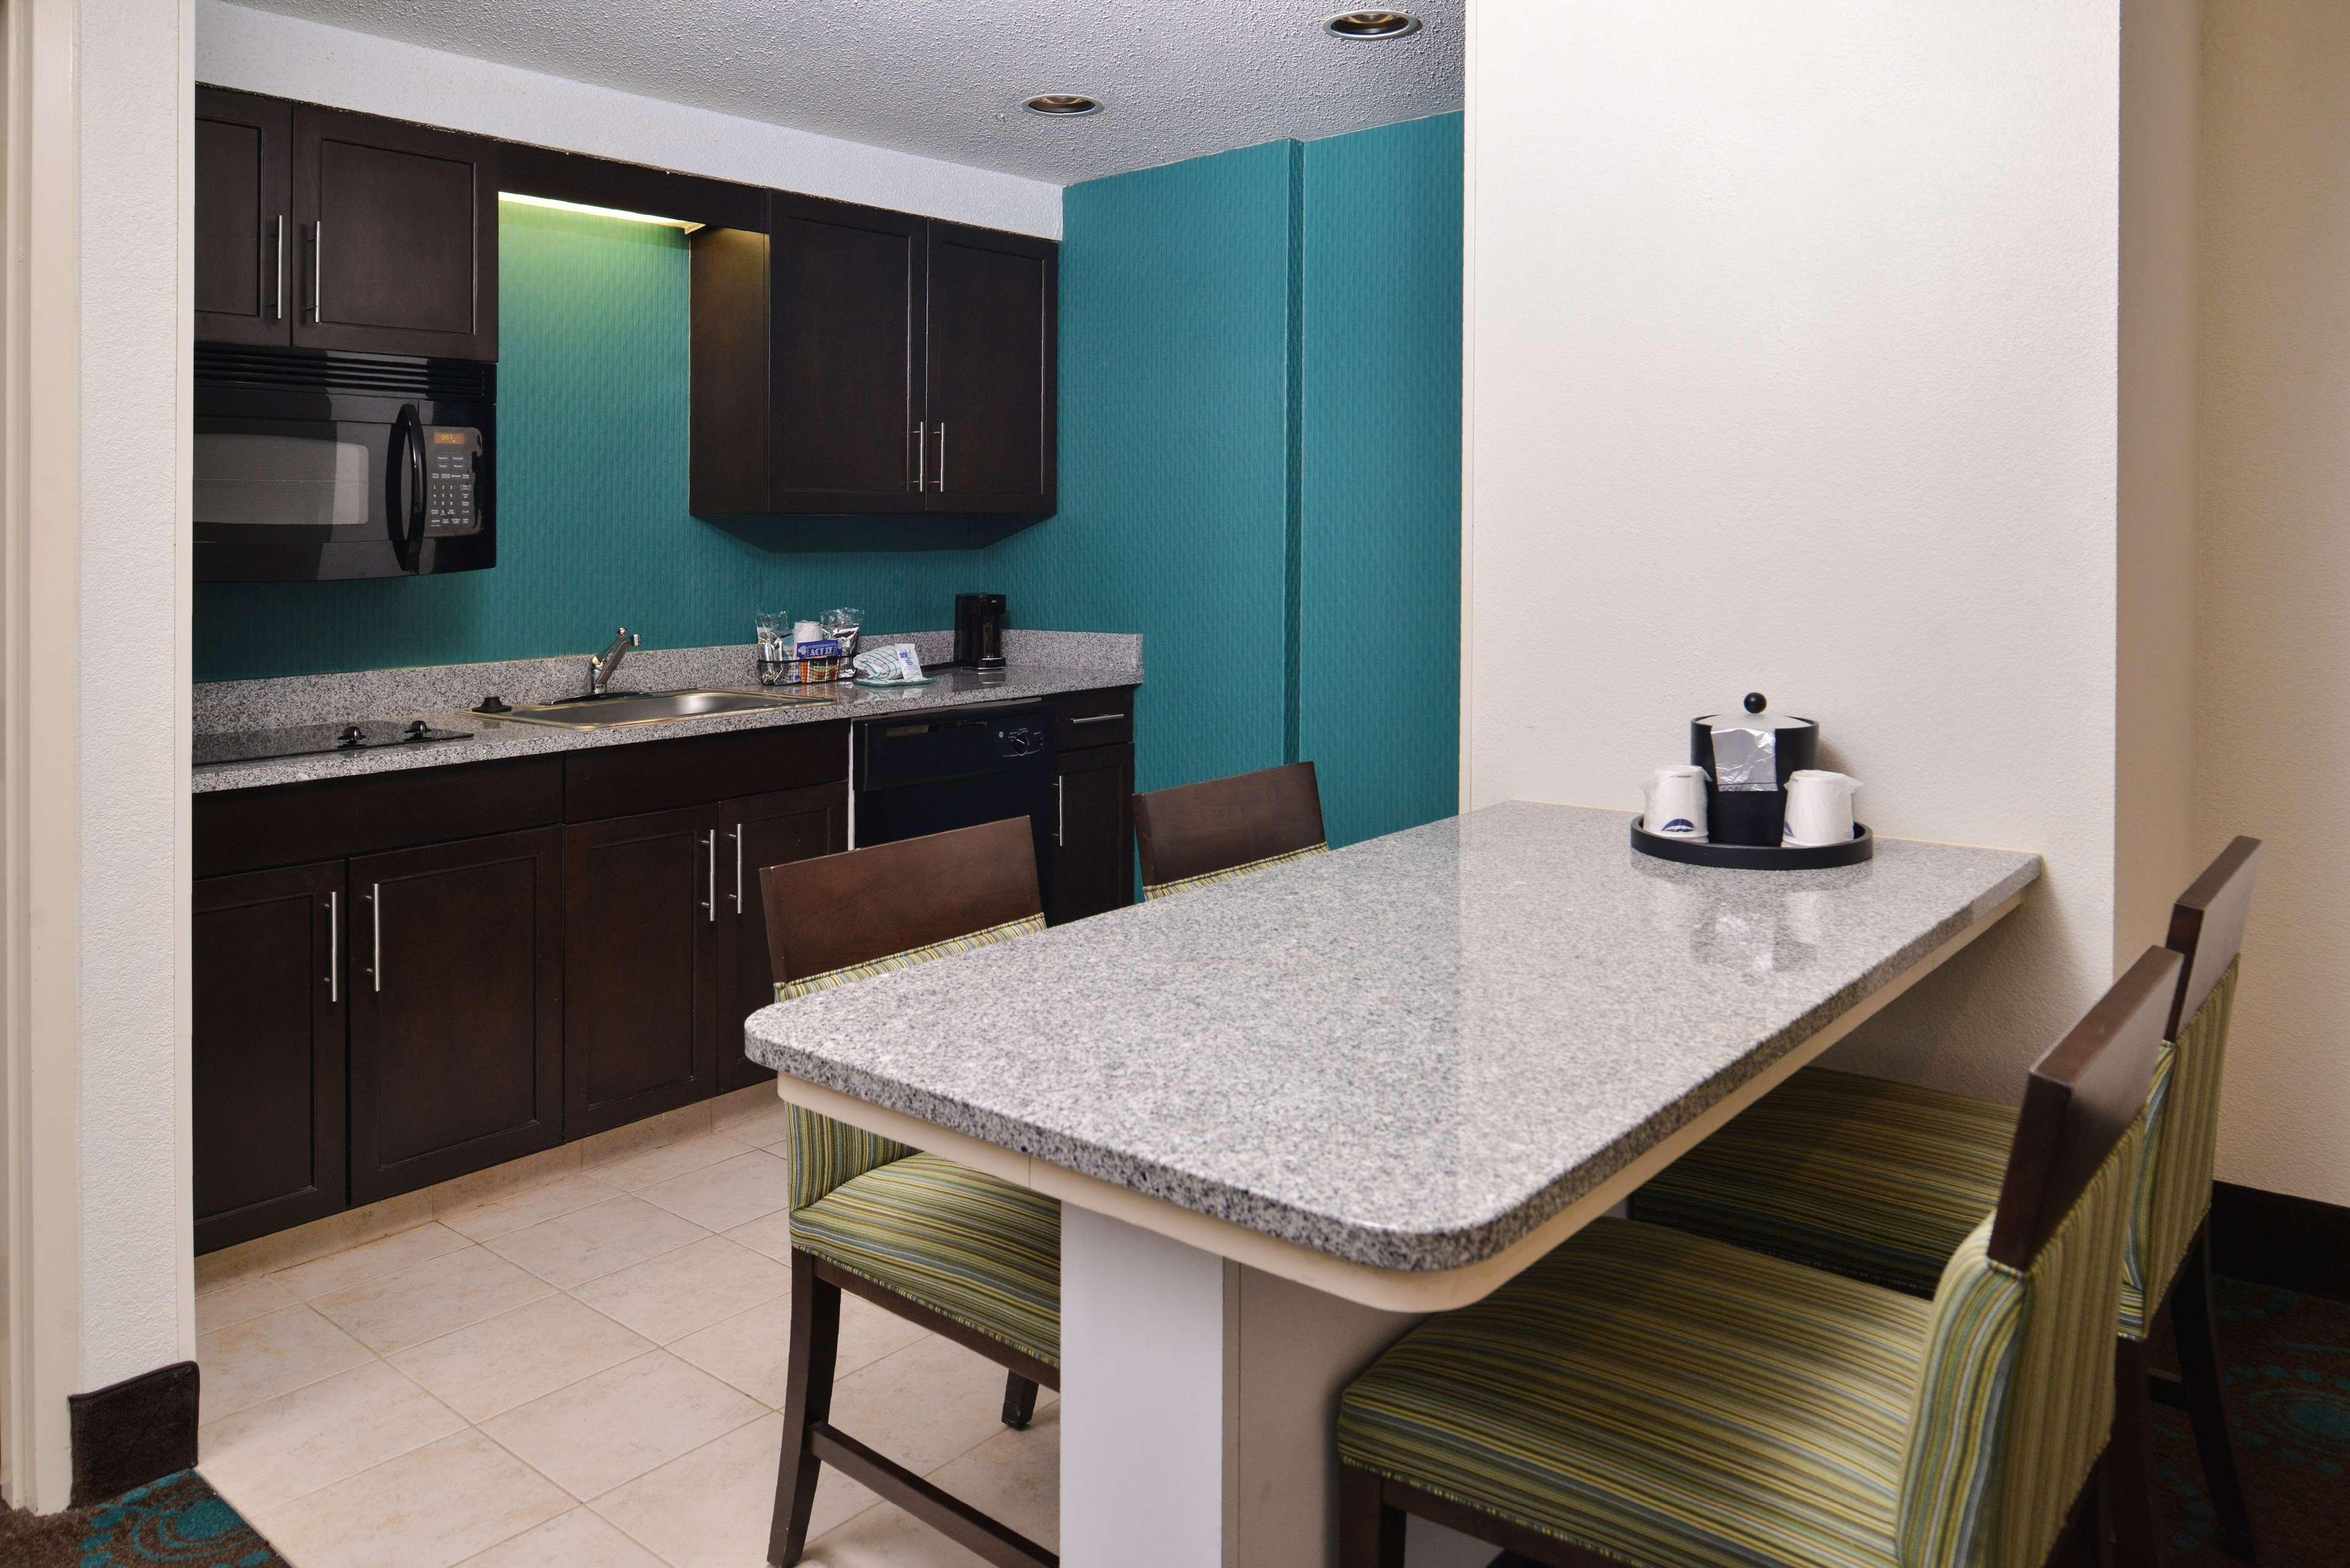 Hampton Inn & Suites Newport News (Oyster Point) image 25